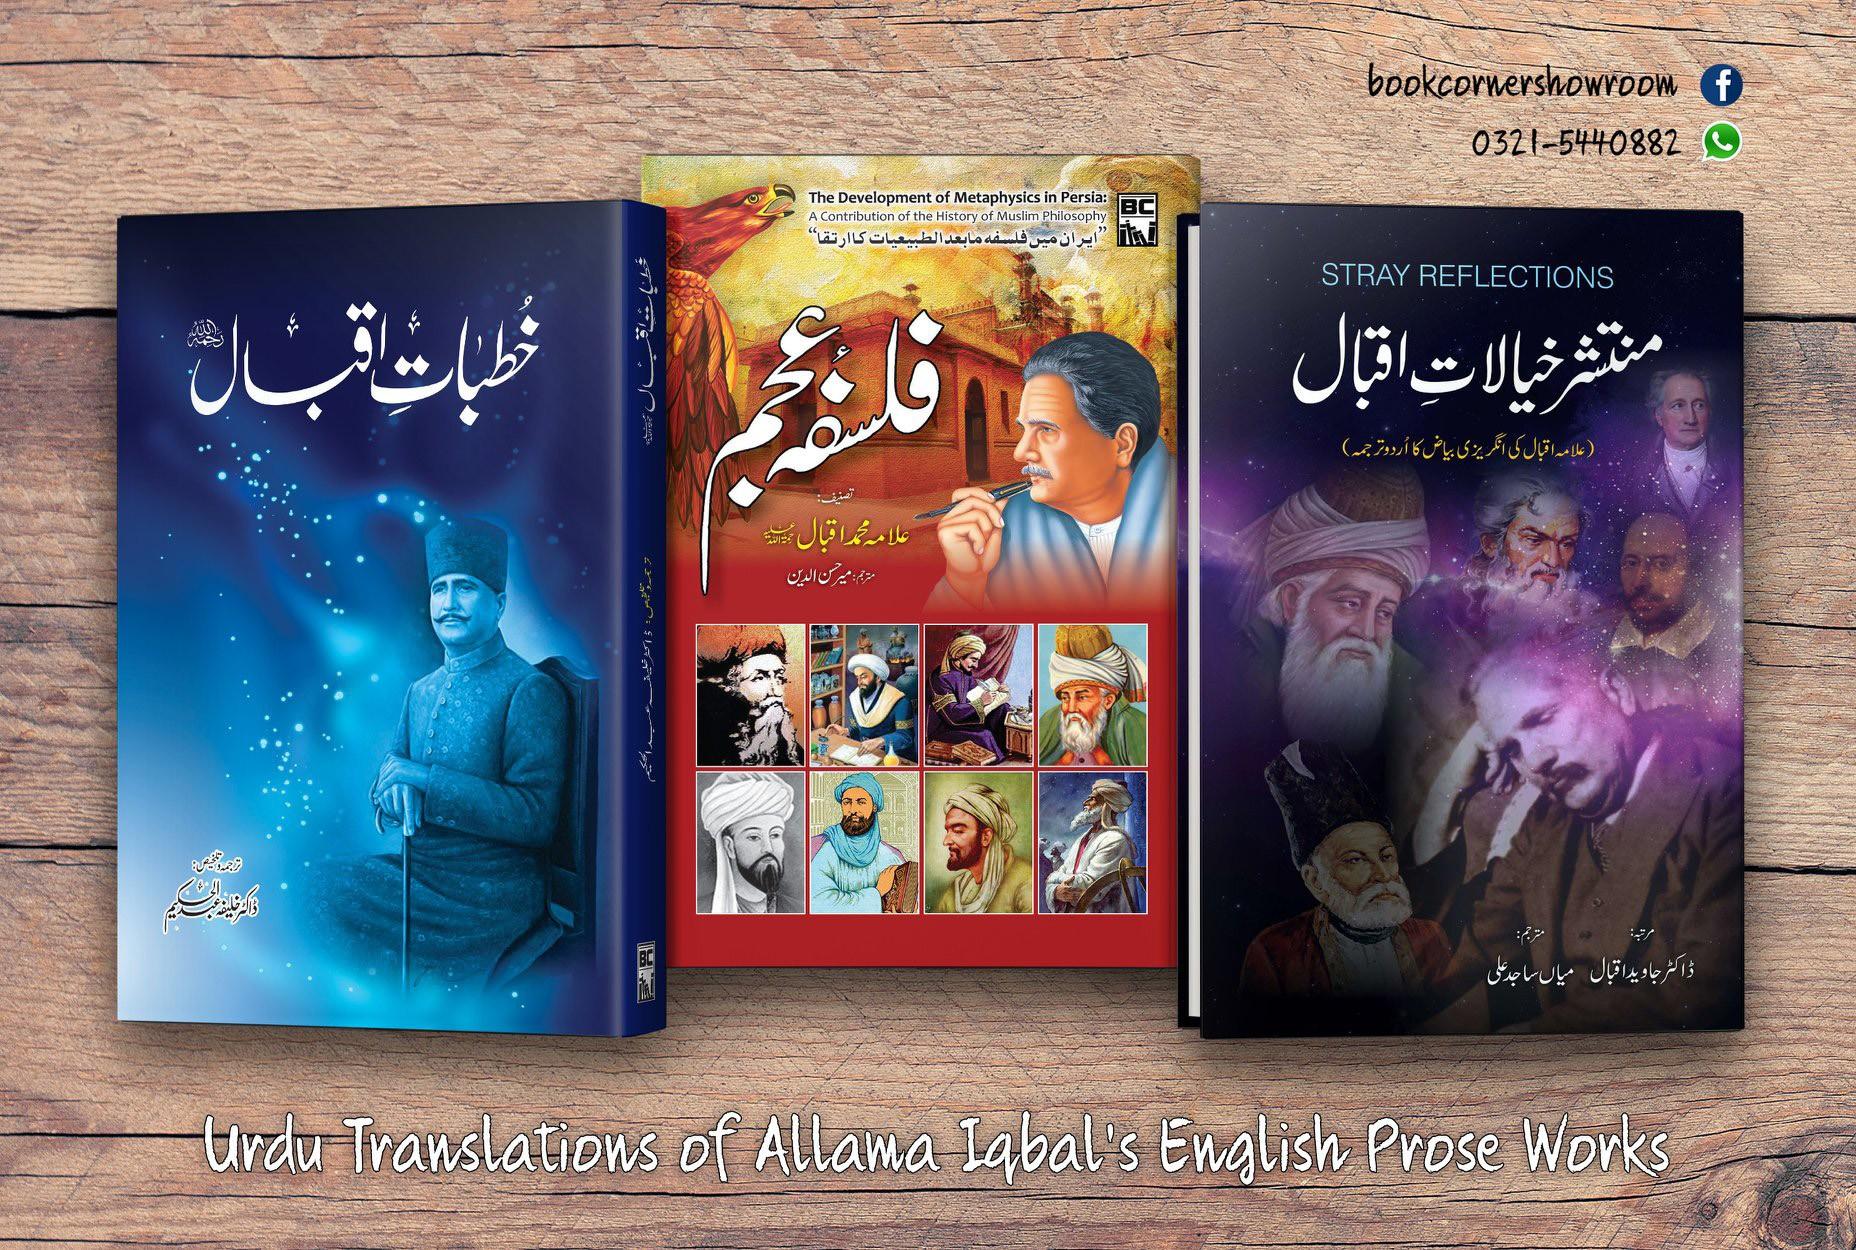 URDU TRANSLATIONS OF ALLAMA IQBAL'S ENGLISH PROSE WORKS